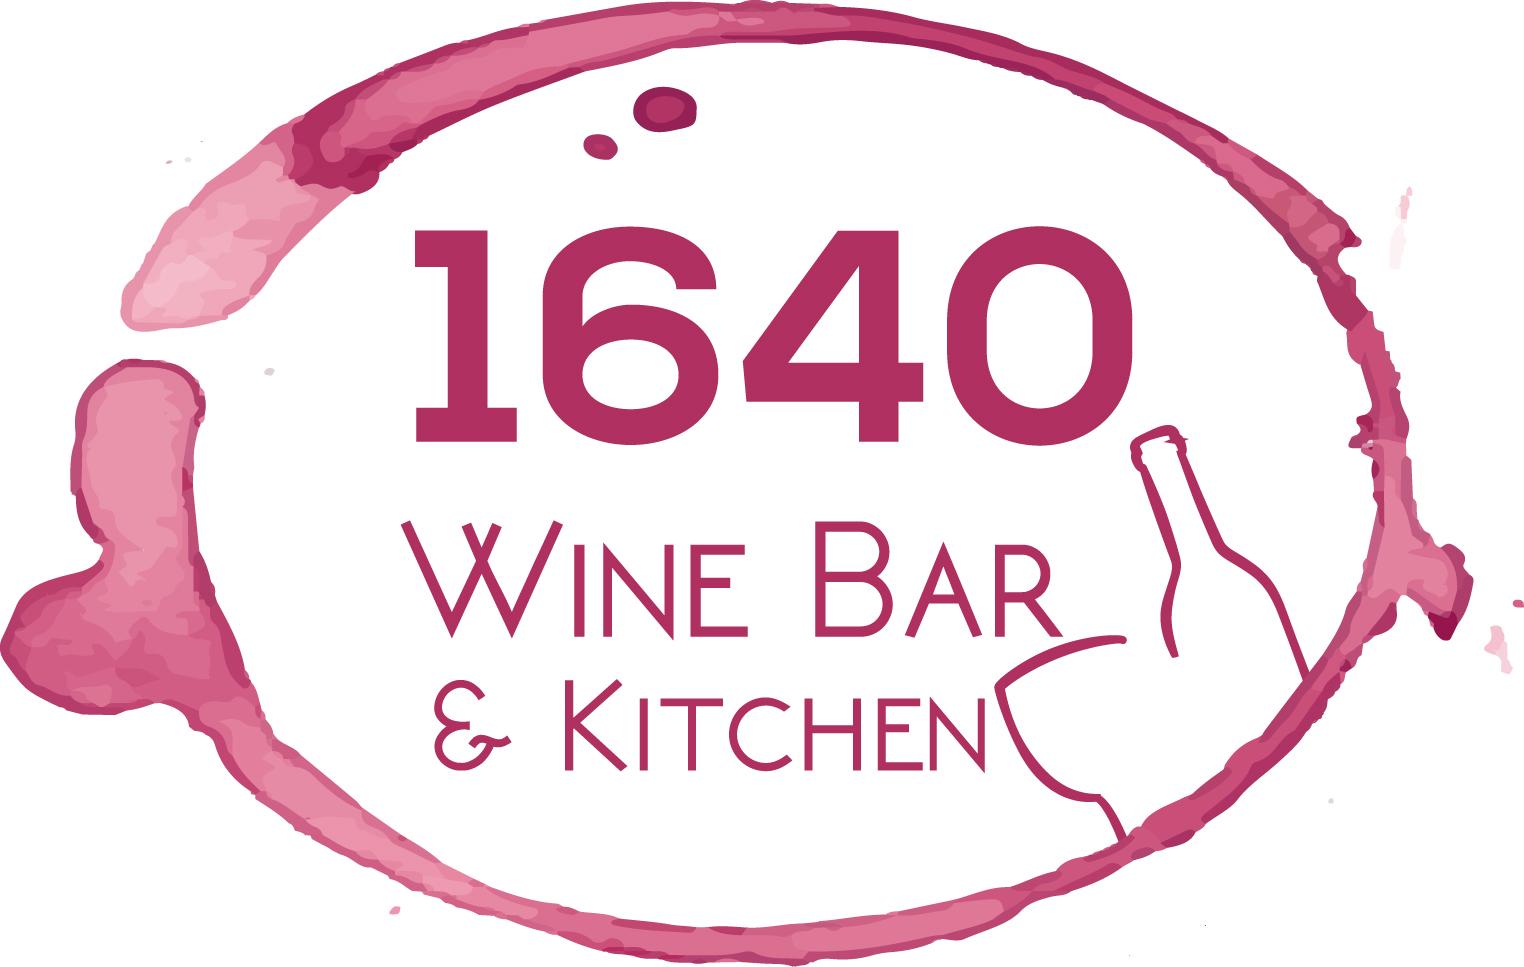 1640 Wine Bar